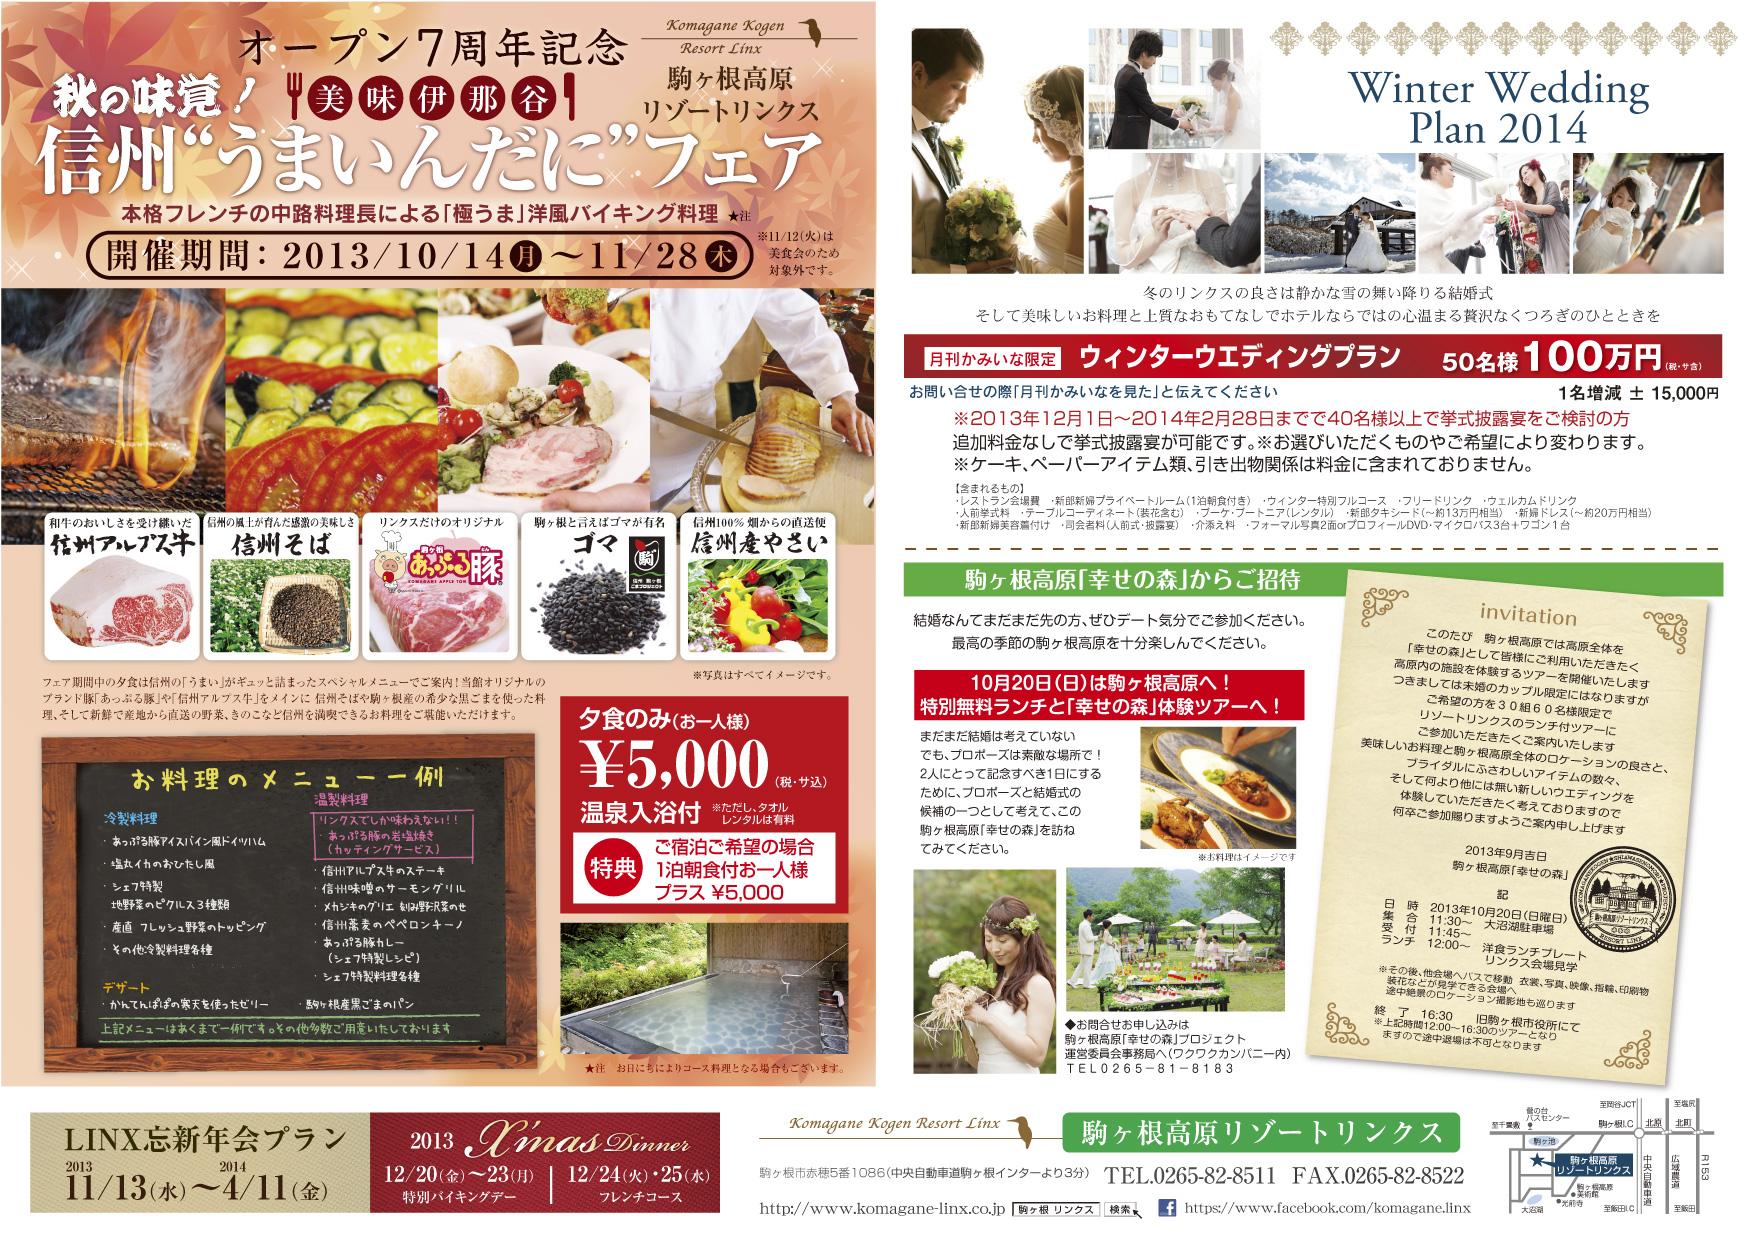 http://www.komagane-linx.co.jp/blogimages/hotel_20130926_kamiina02.jpg